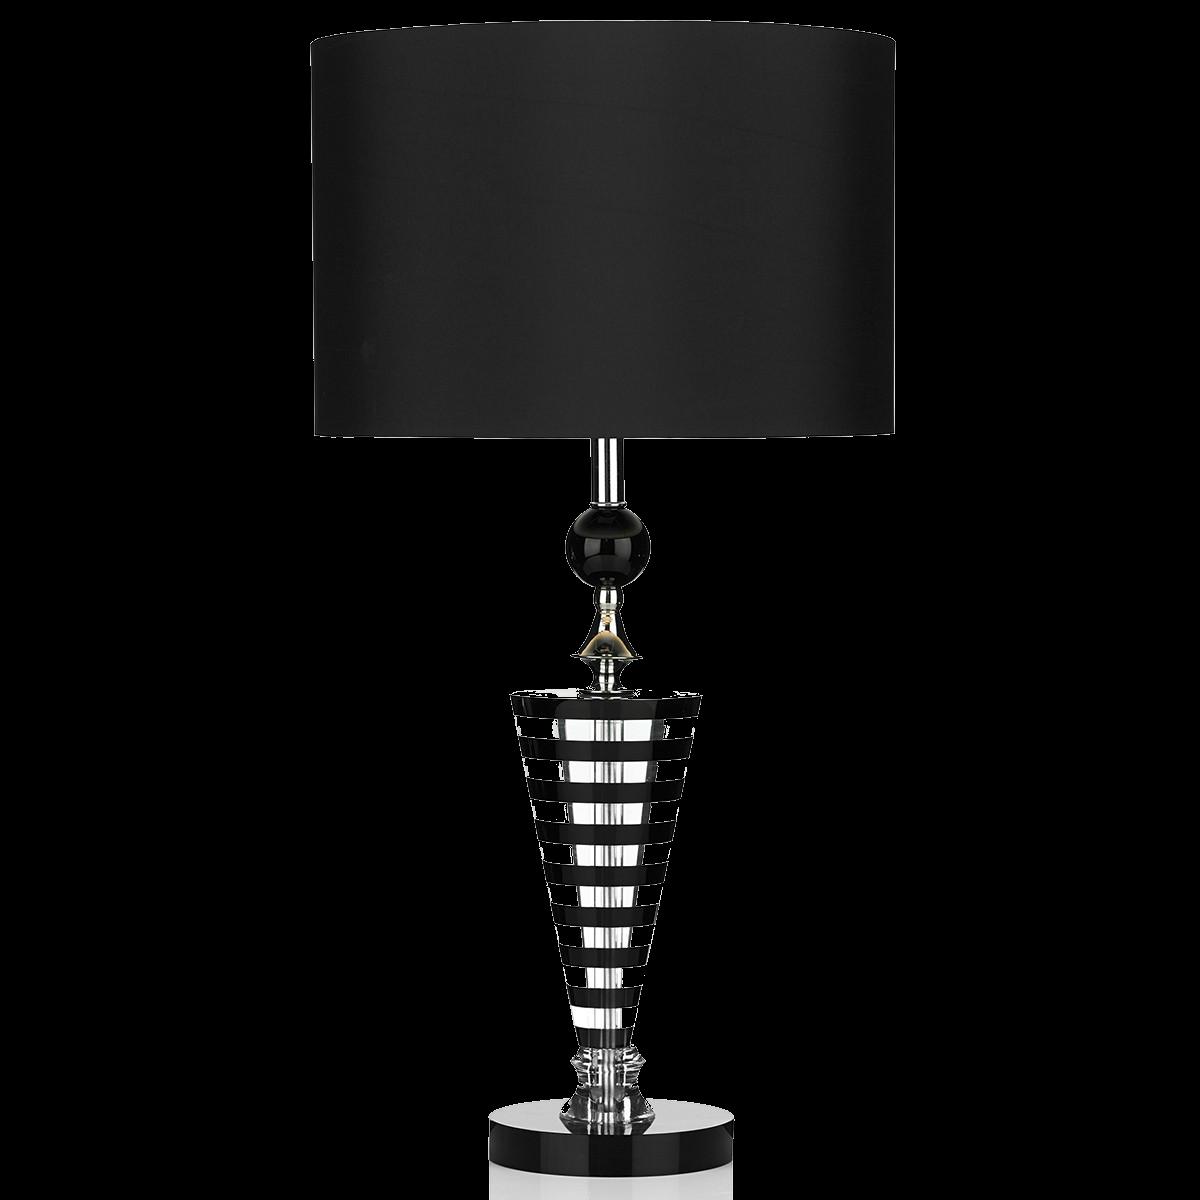 83 Reference Of Lamps Png Desk Lamp In 2020 Lamp Large Lamp Shade Desk Lamp